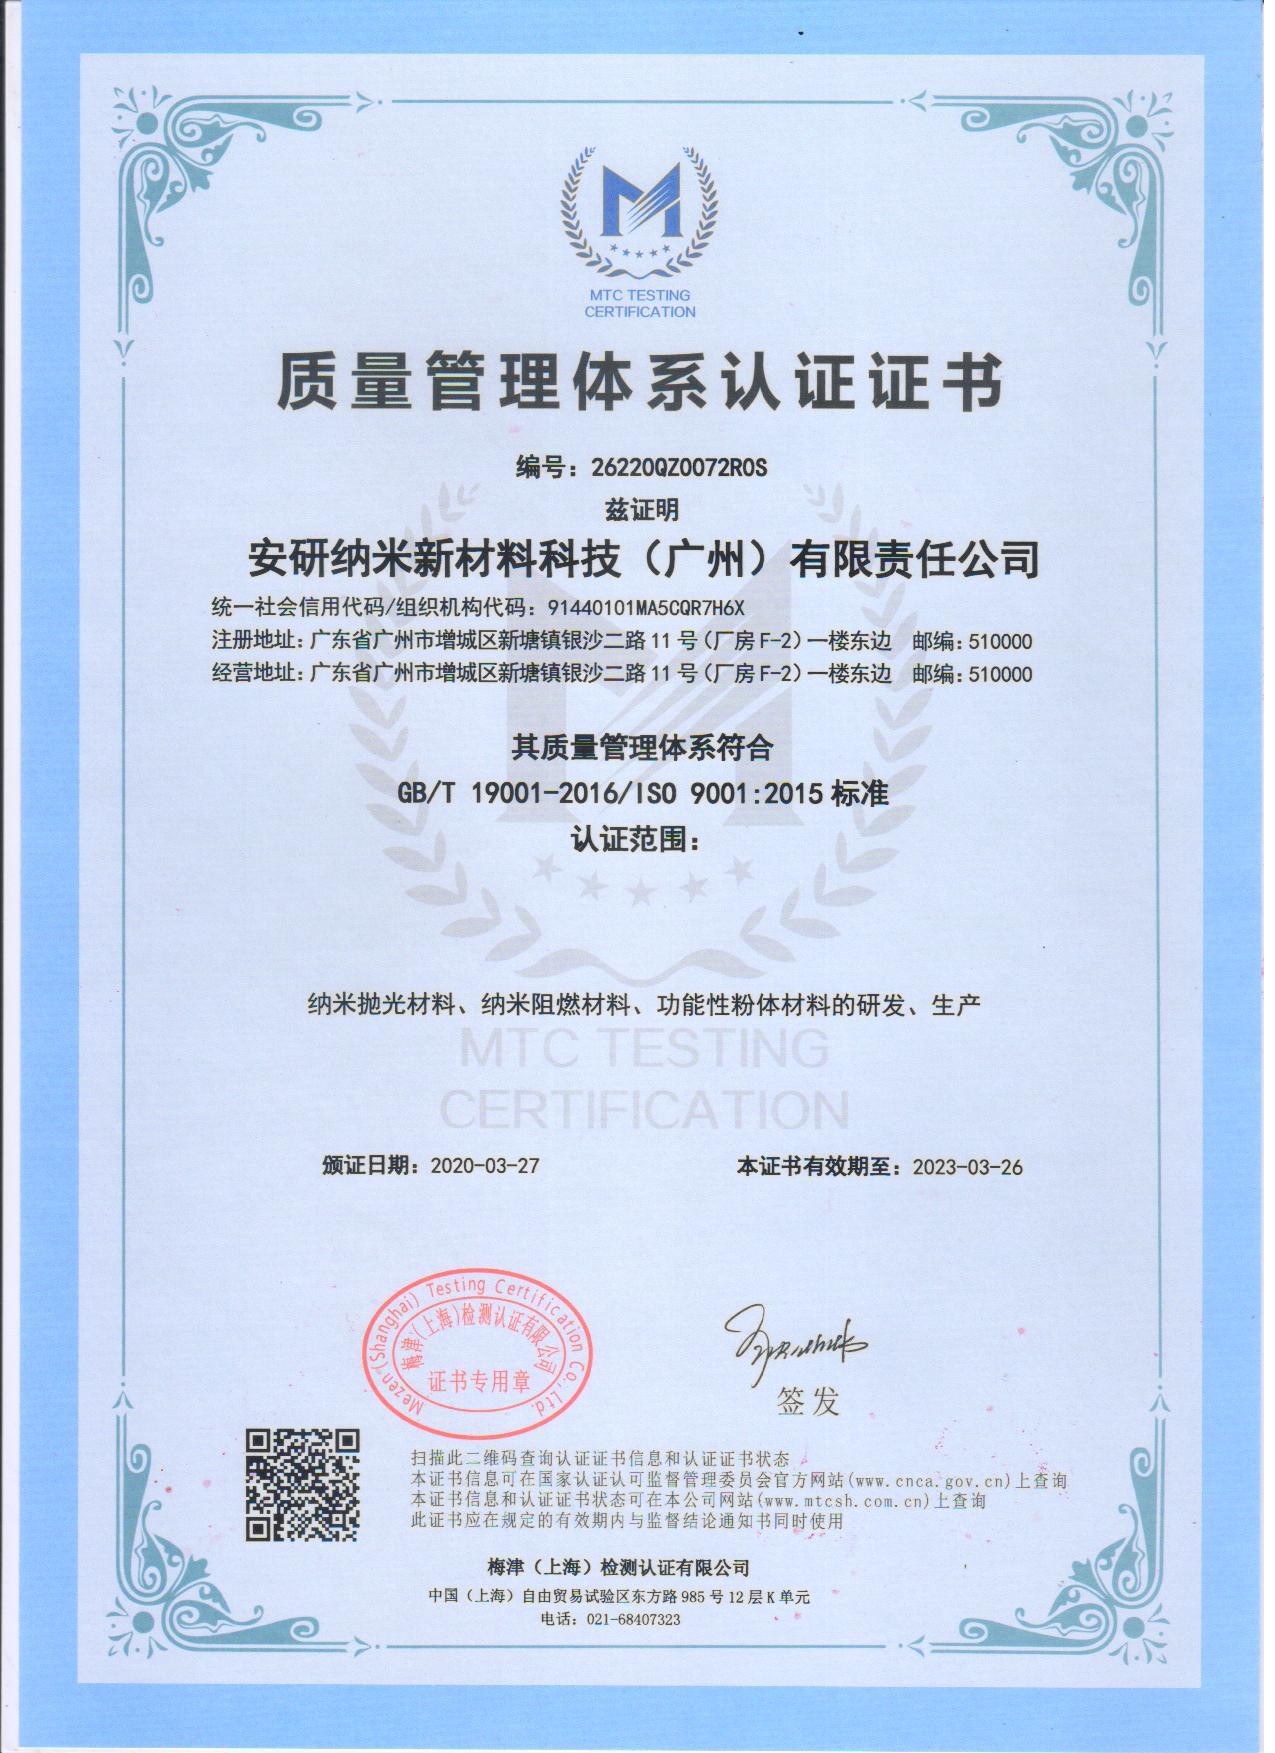 質量體系認證書